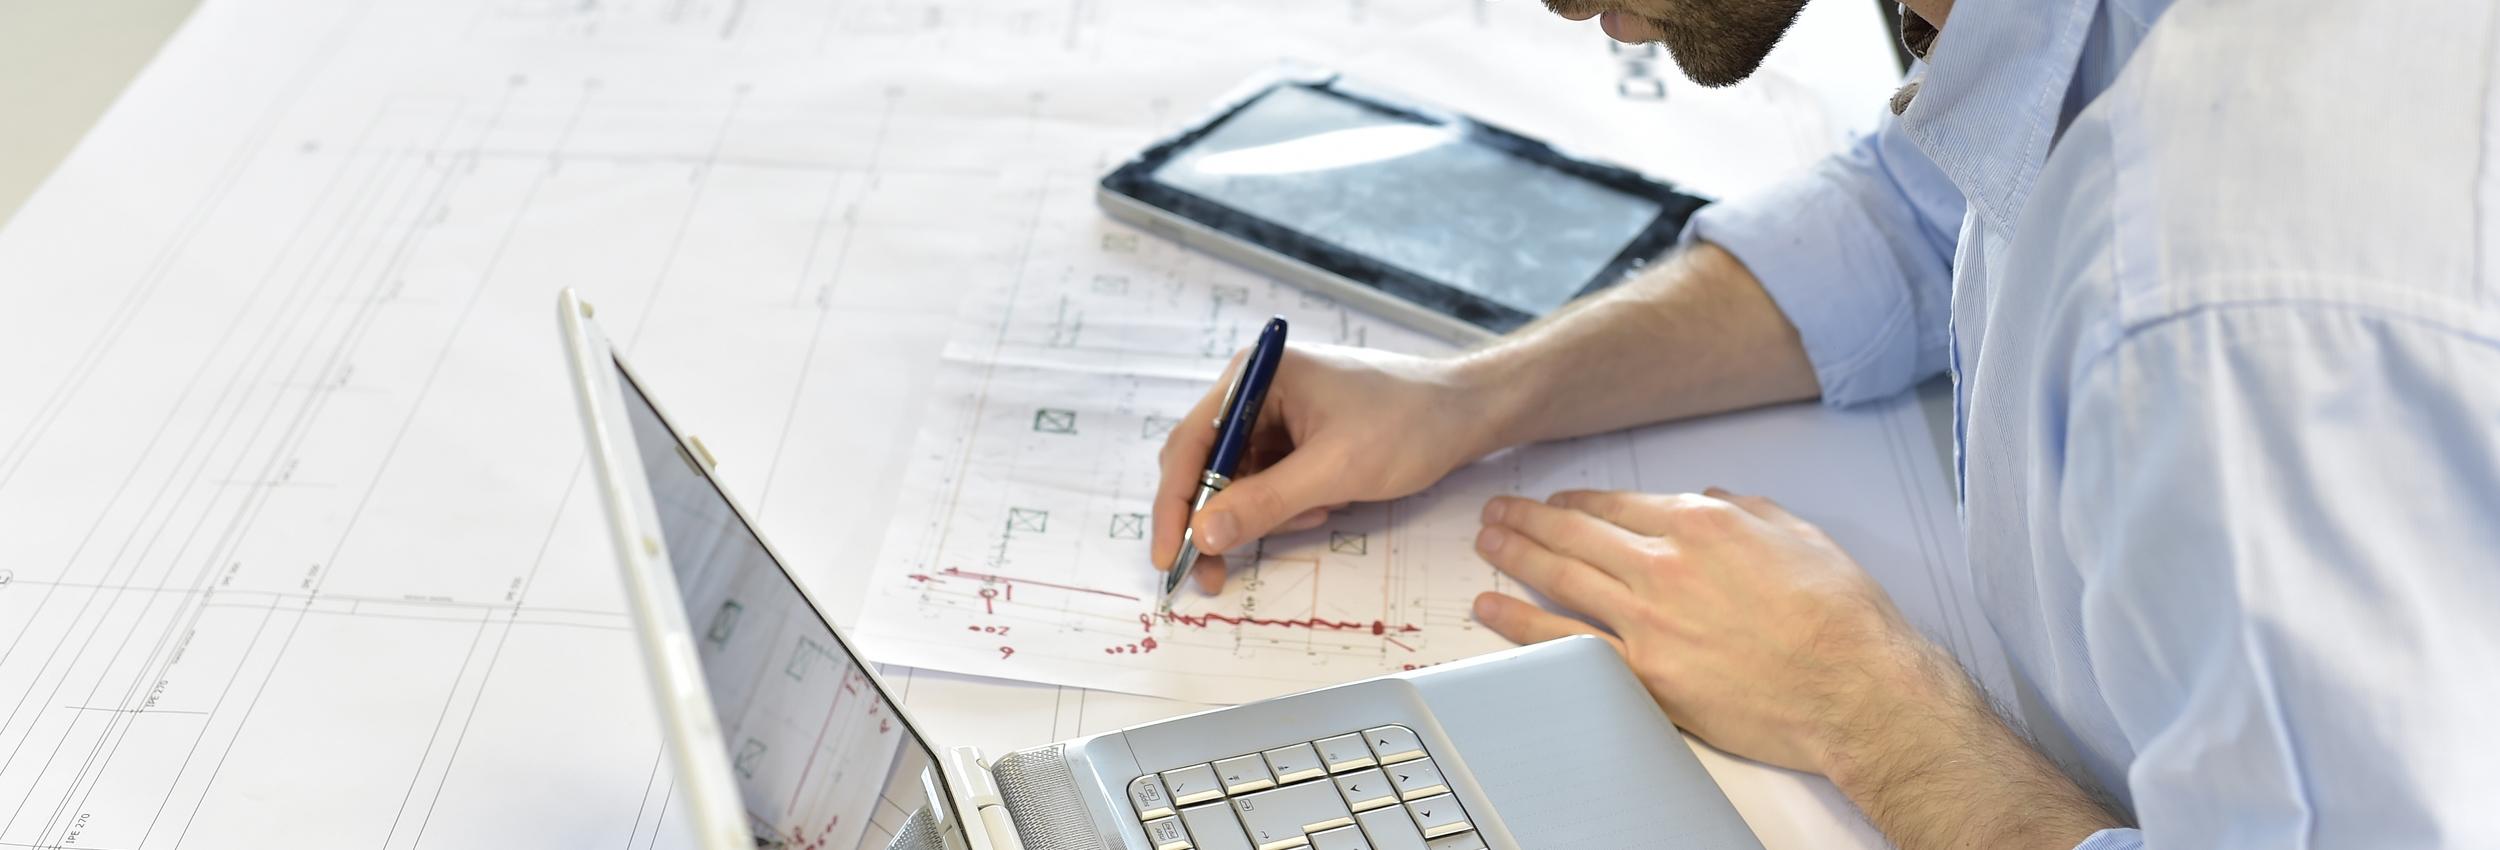 Atronix Engineering, design engineering, atronixengineering.com